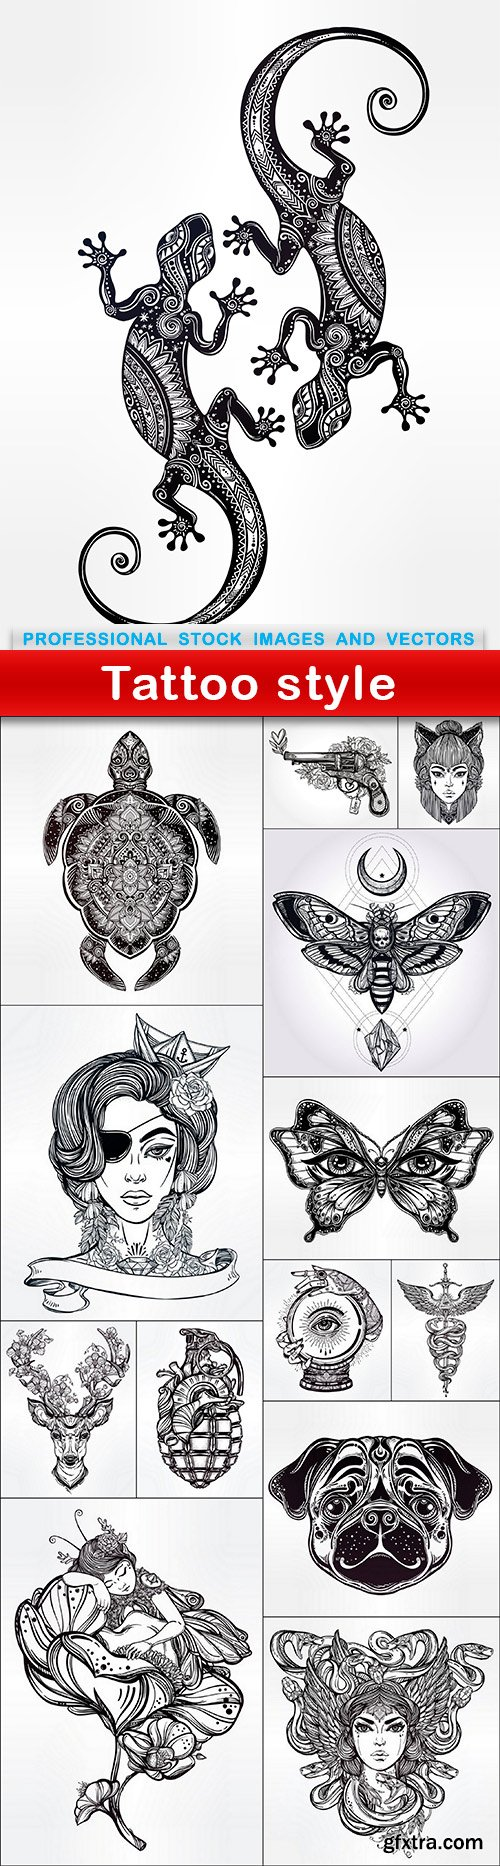 Tattoo style - 14 EPS